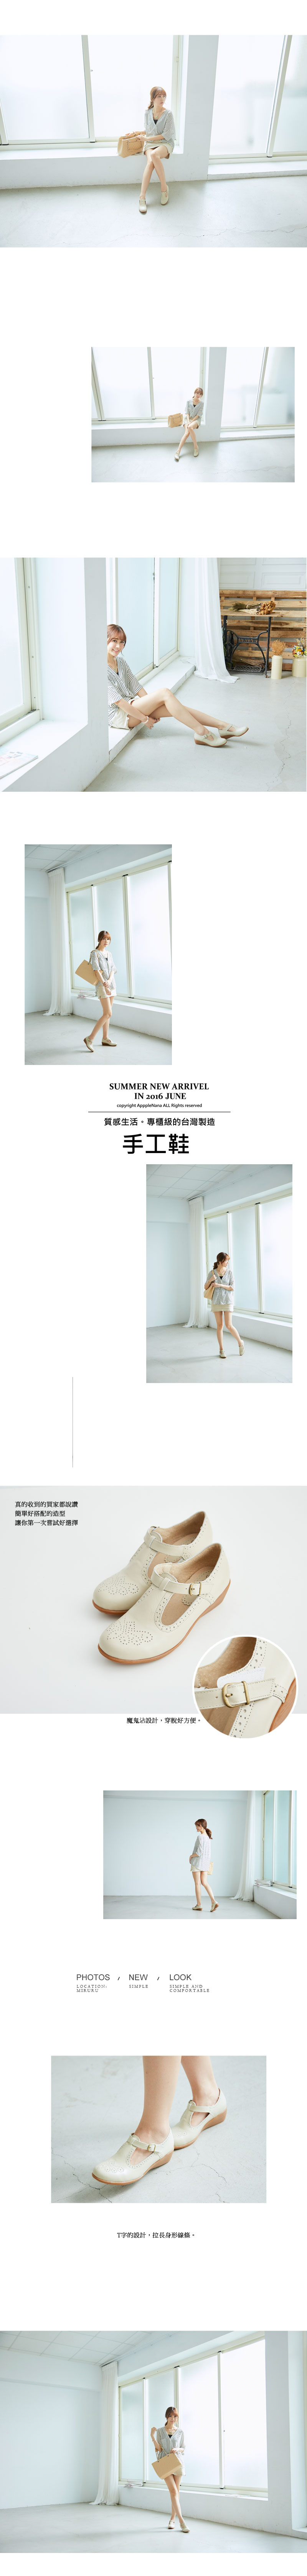 http://shop.r10s.com/5e7ca0c0-ec8c-11e4-ac44-005056b756e3/2016-06/2124-4.jpg